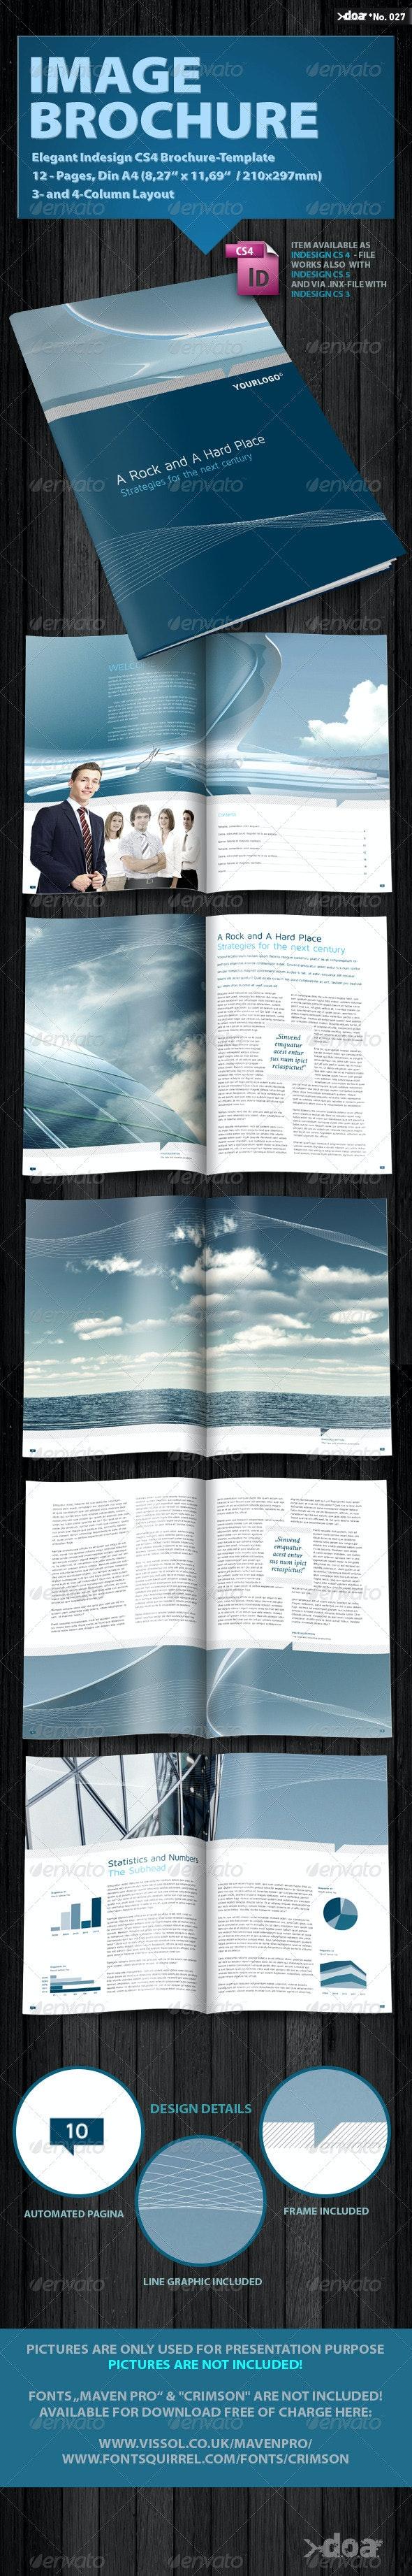 Elegant Image Brochure - Corporate Brochures